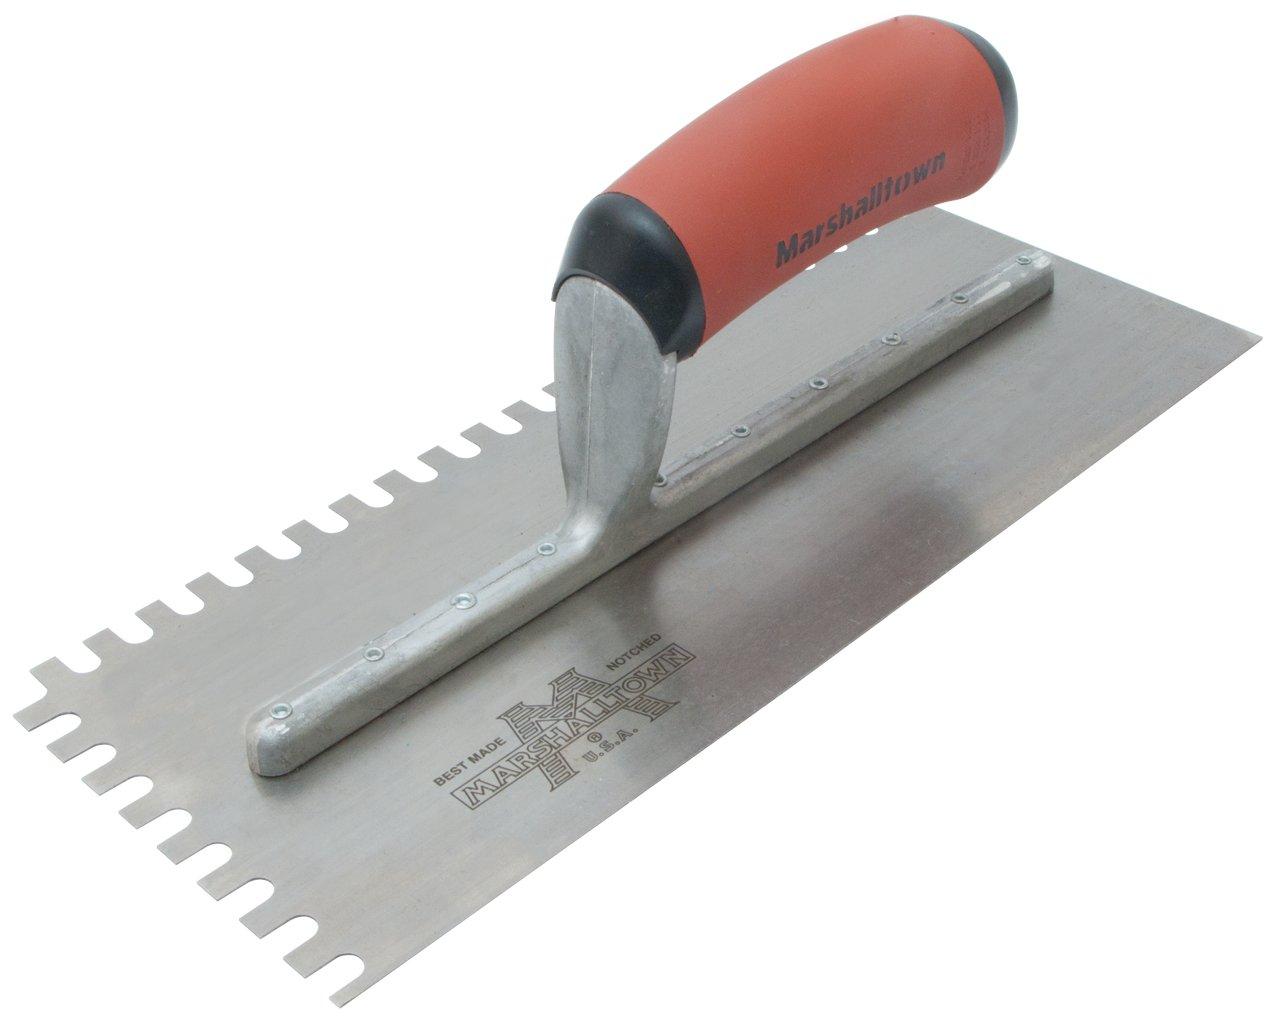 Marshalltown NT686 Notched Trowel 1/4 x 3/8 x 1/4-Inch U-Soft Grip Handle